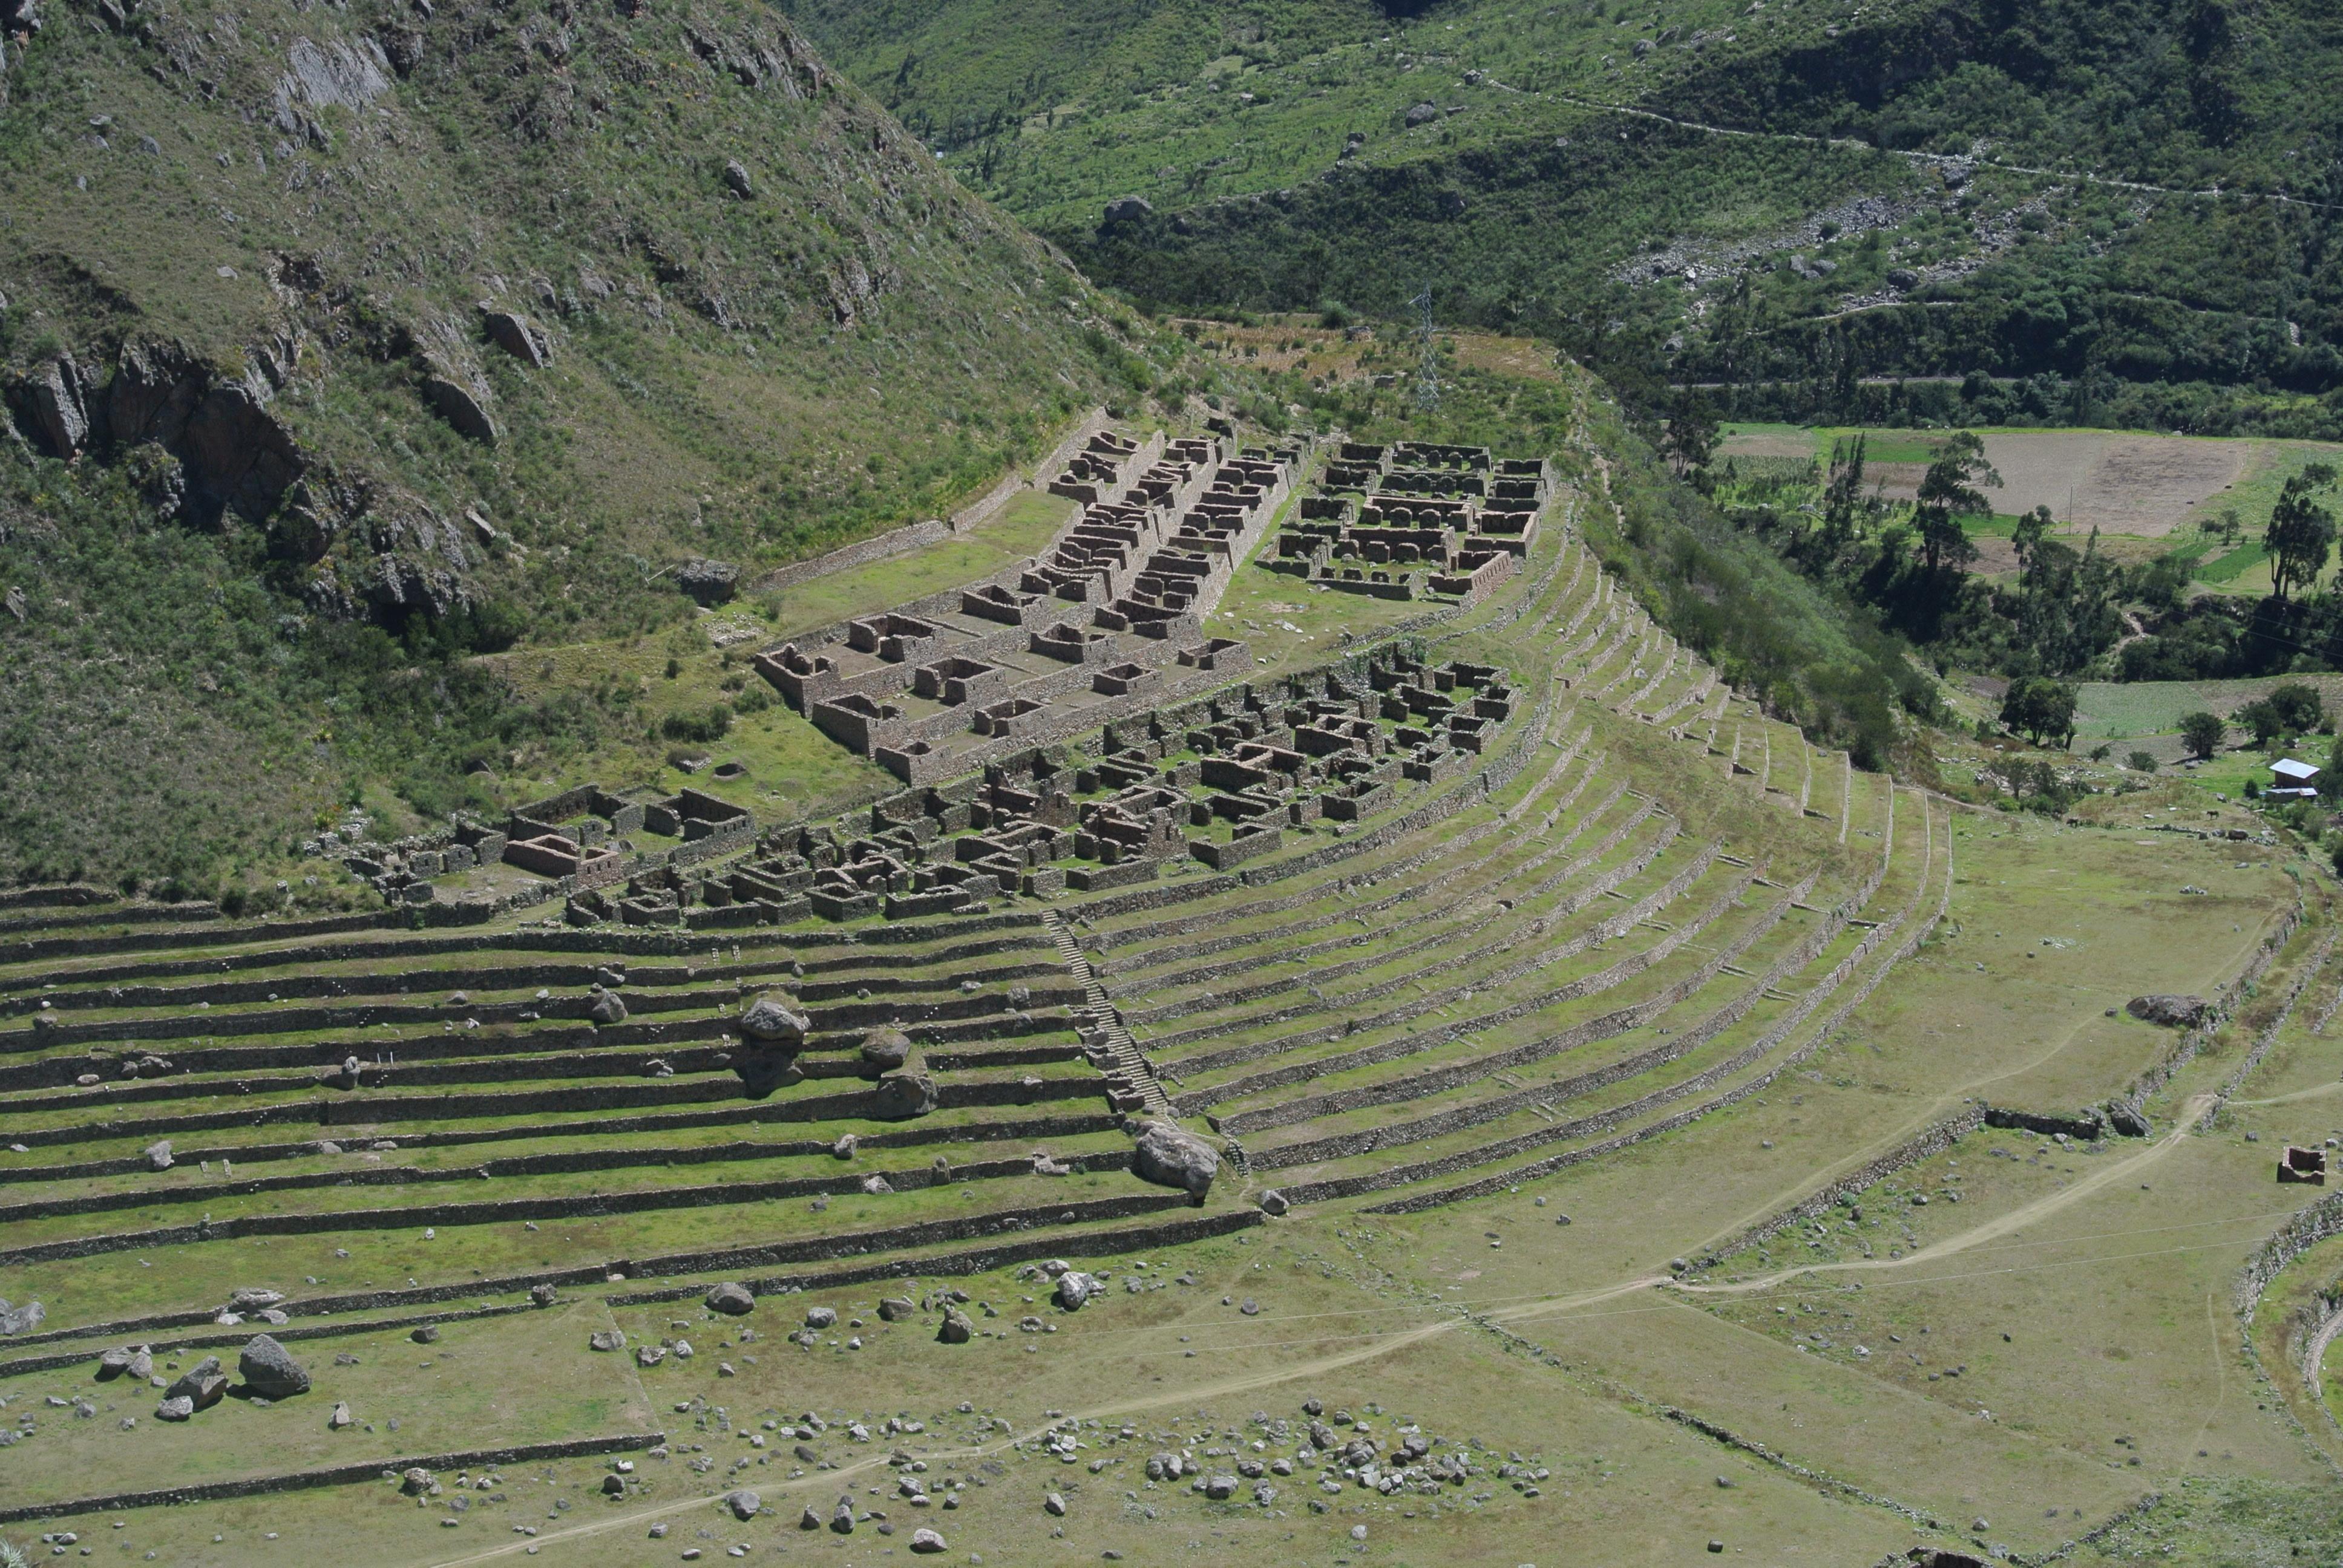 View of Machu Pichu